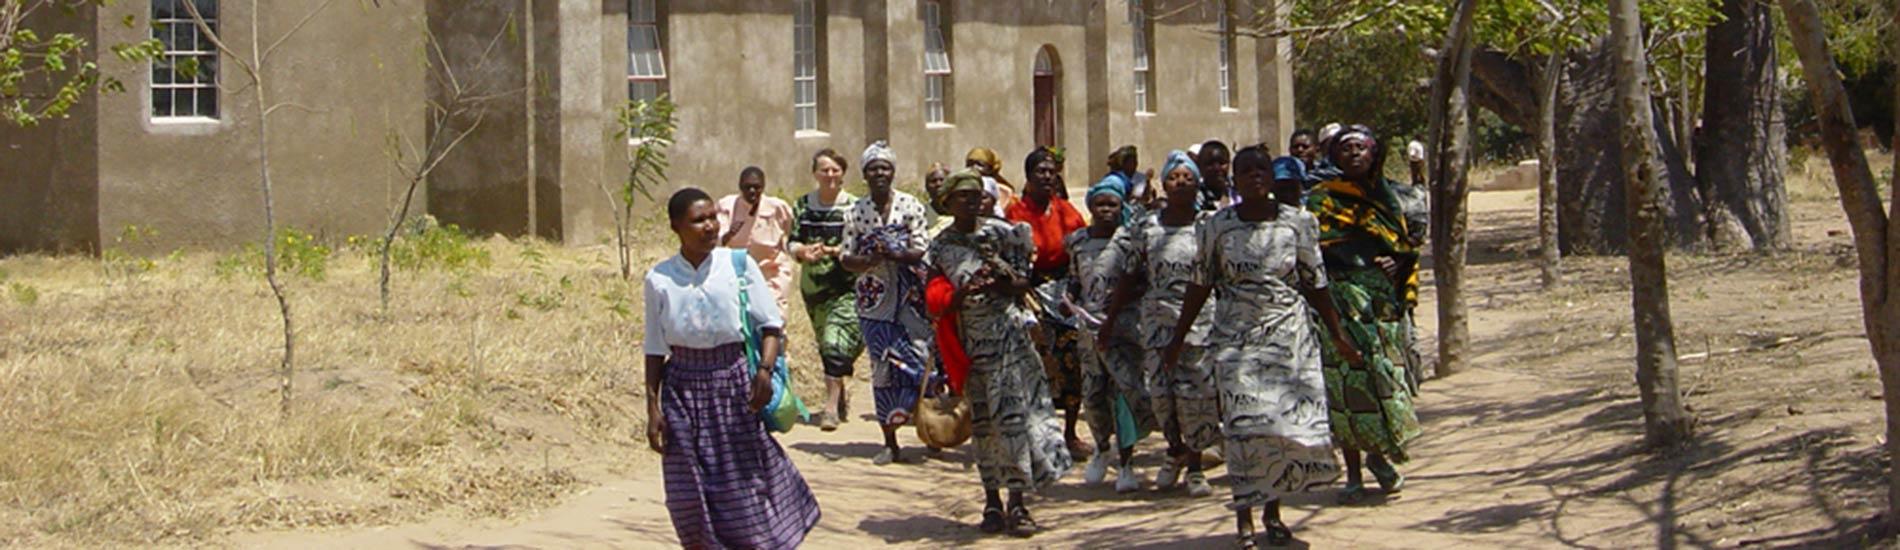 Künstlermeile Haar 2014: Besuch aus Ilembula